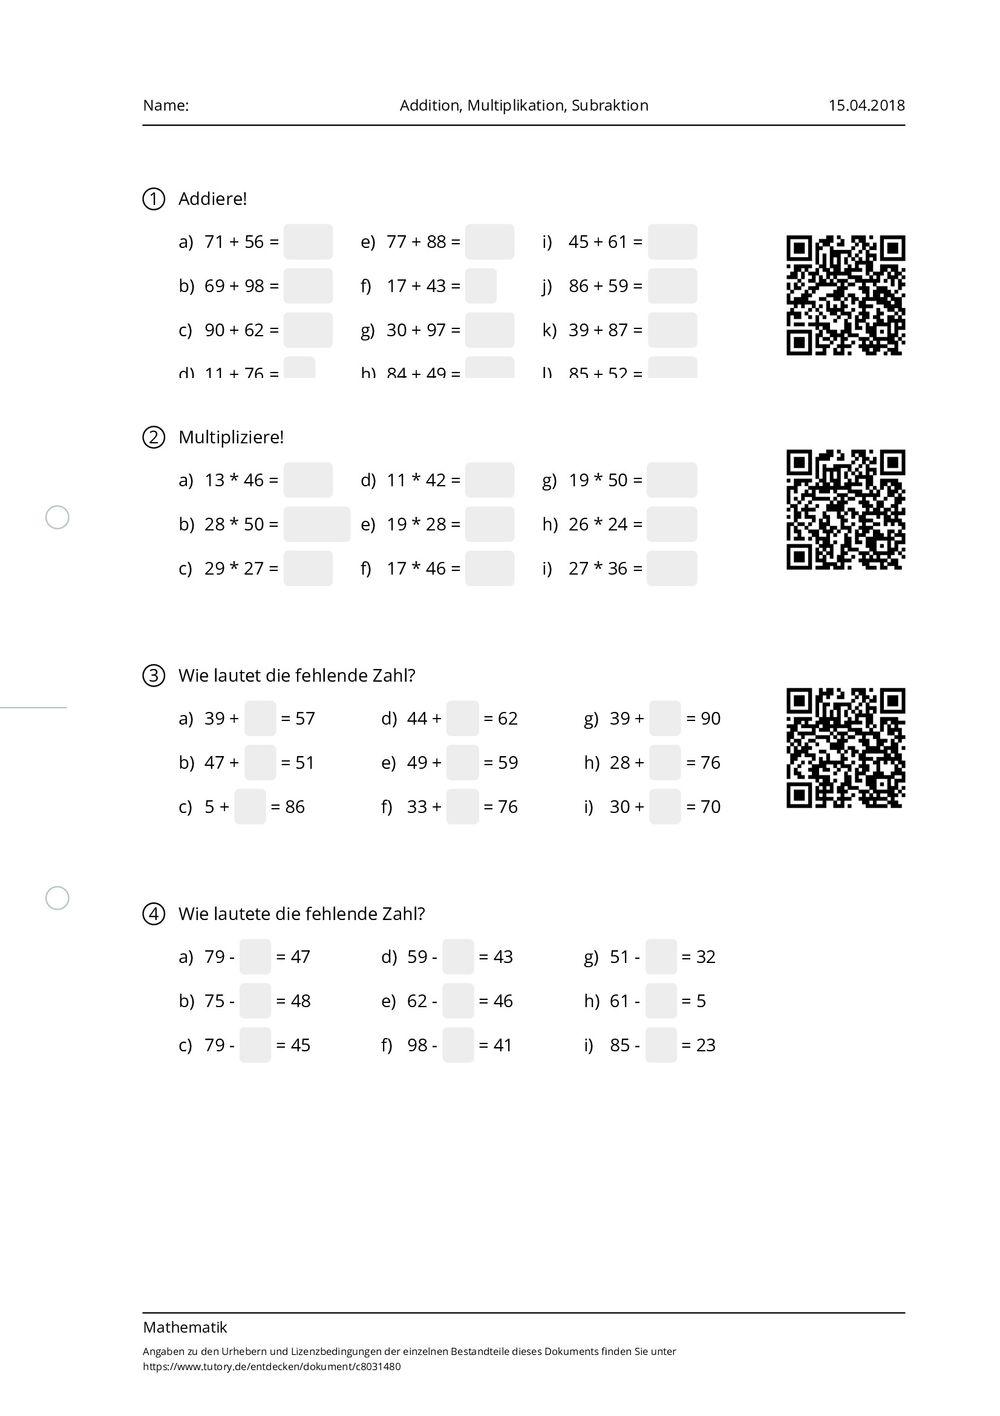 arbeitsblatt addition multiplikation subraktion mathematik volkshochschulkurs. Black Bedroom Furniture Sets. Home Design Ideas